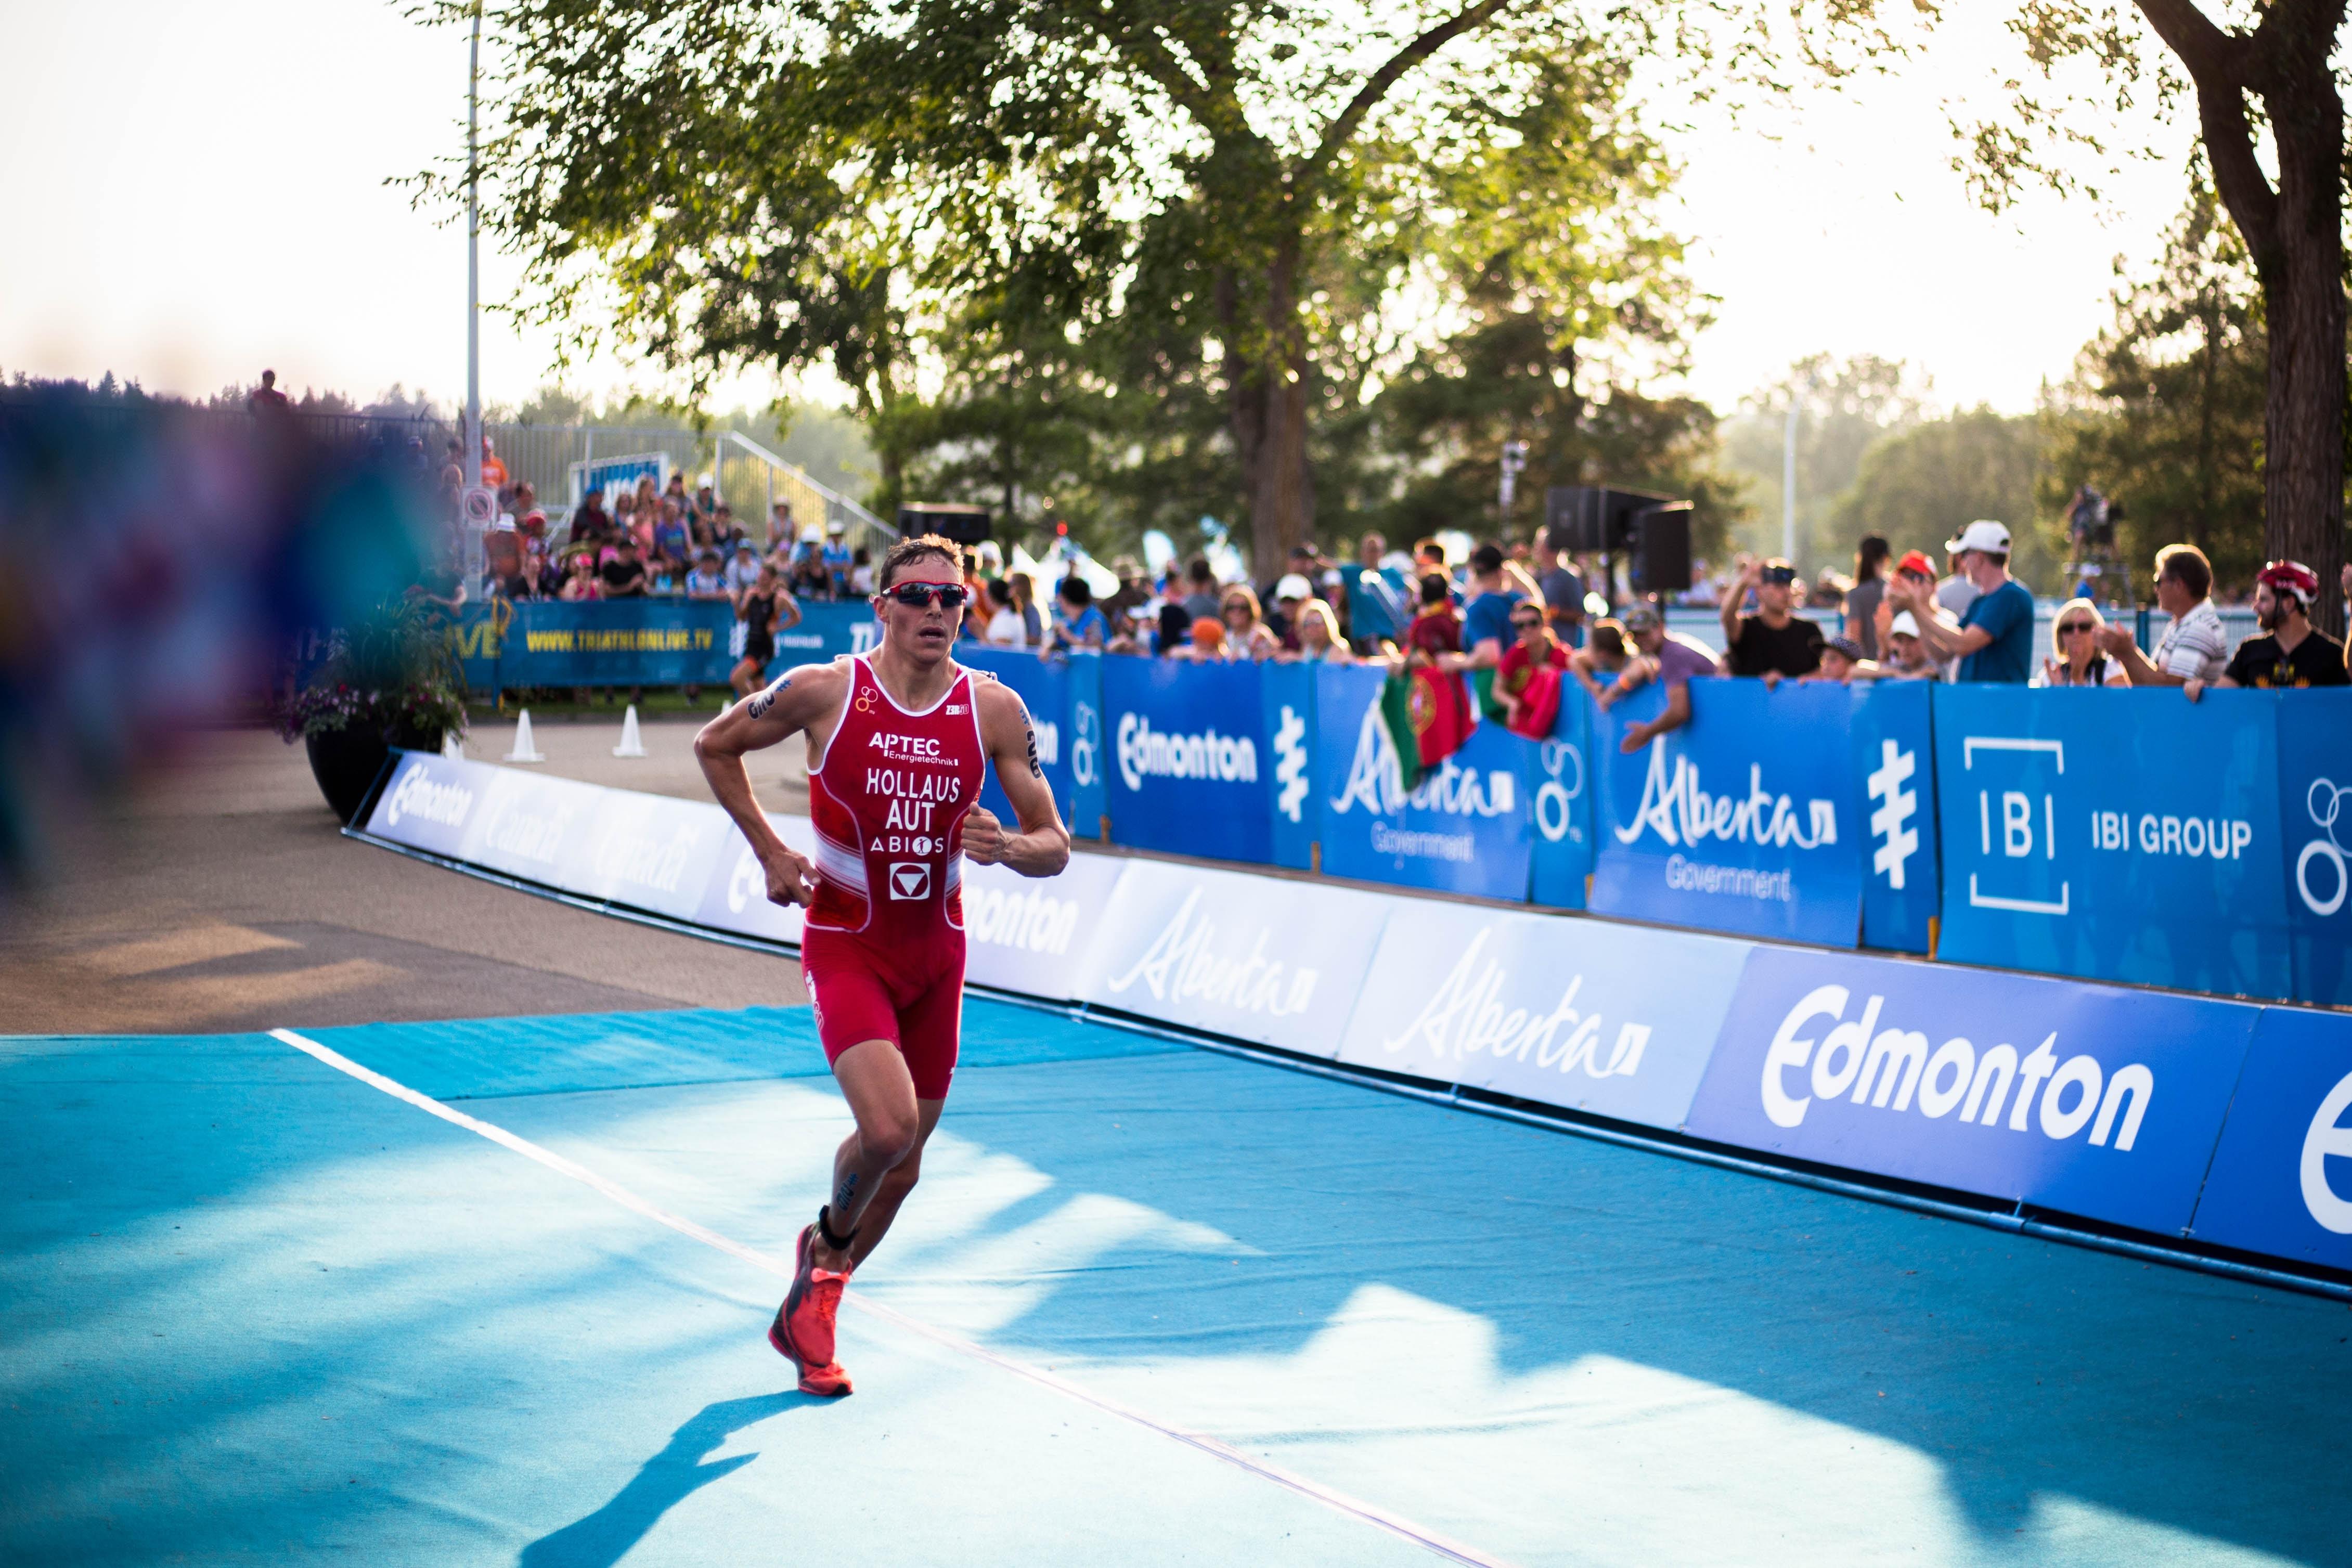 man in red tank top running